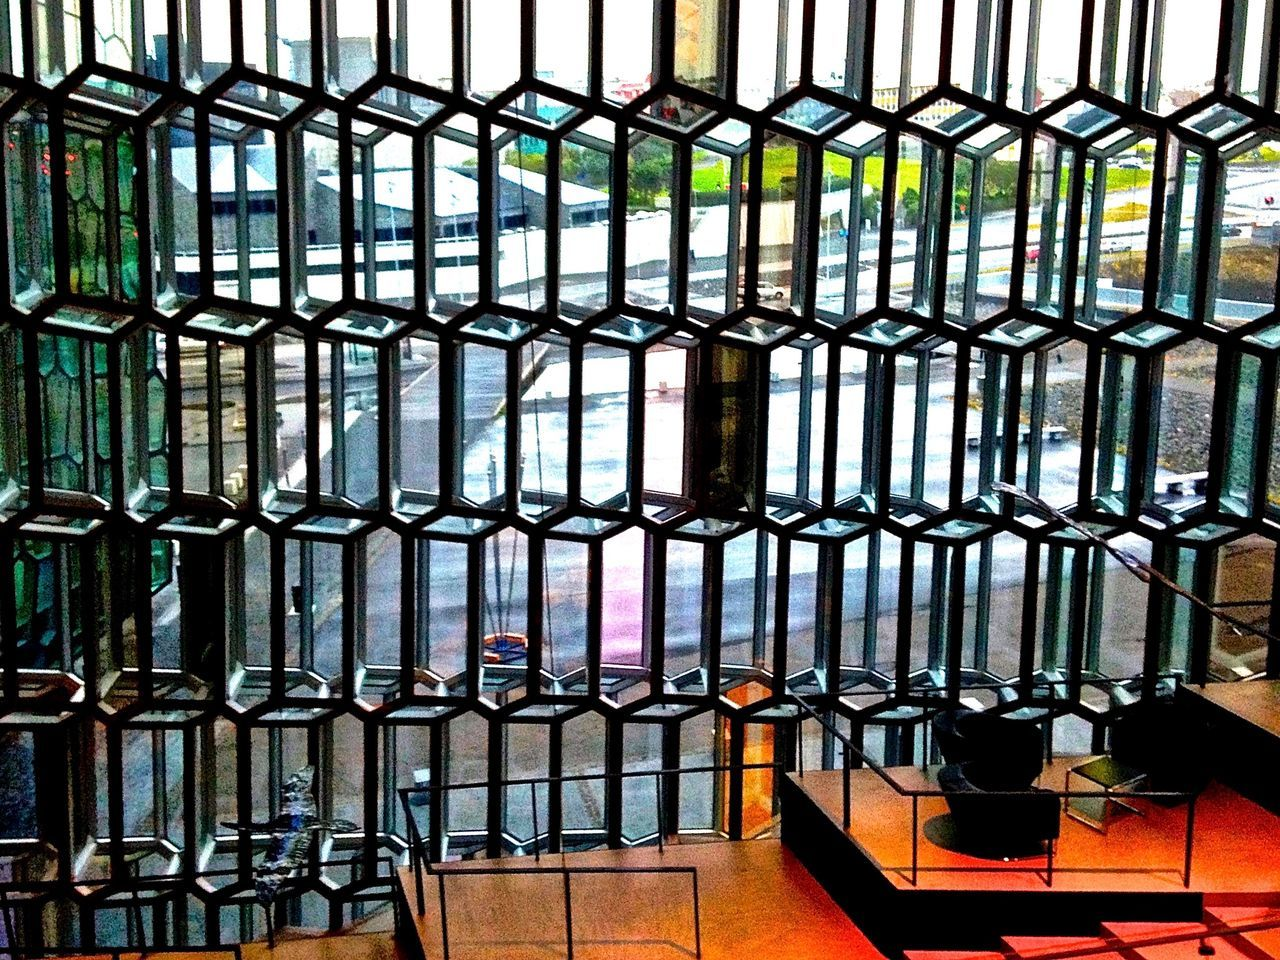 The Architect - 2015 EyeEm Awards Amazing Architecture Olafur Eliasson Konzerthaus Harpa Reykjavik Architecture Iceland Memories Iceland_collection Iceland